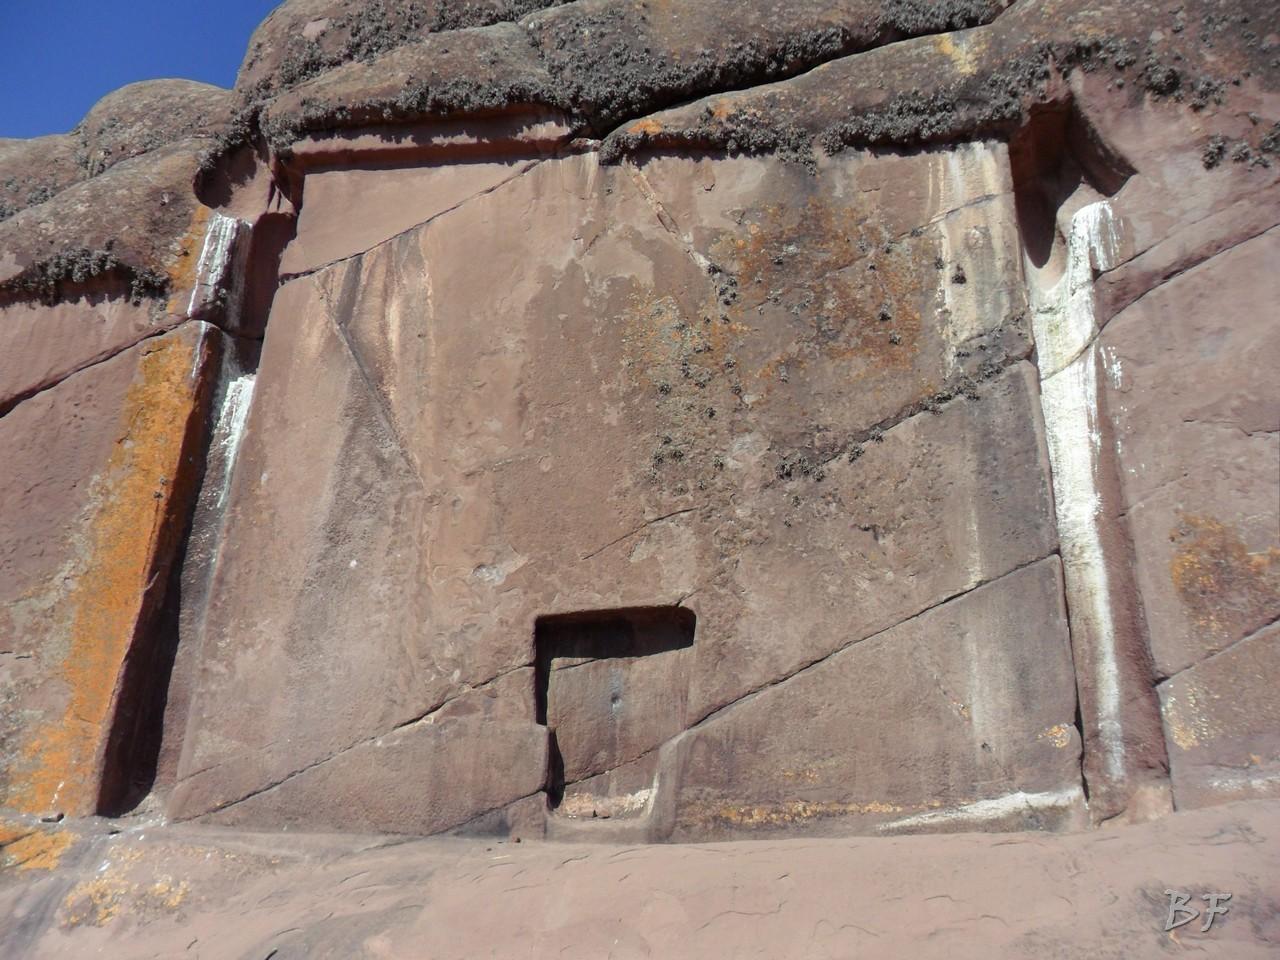 Edificio-Rupestre-Porta-Dimensionale-Megaliti-Aramu-Muru-Puno-Perù-5